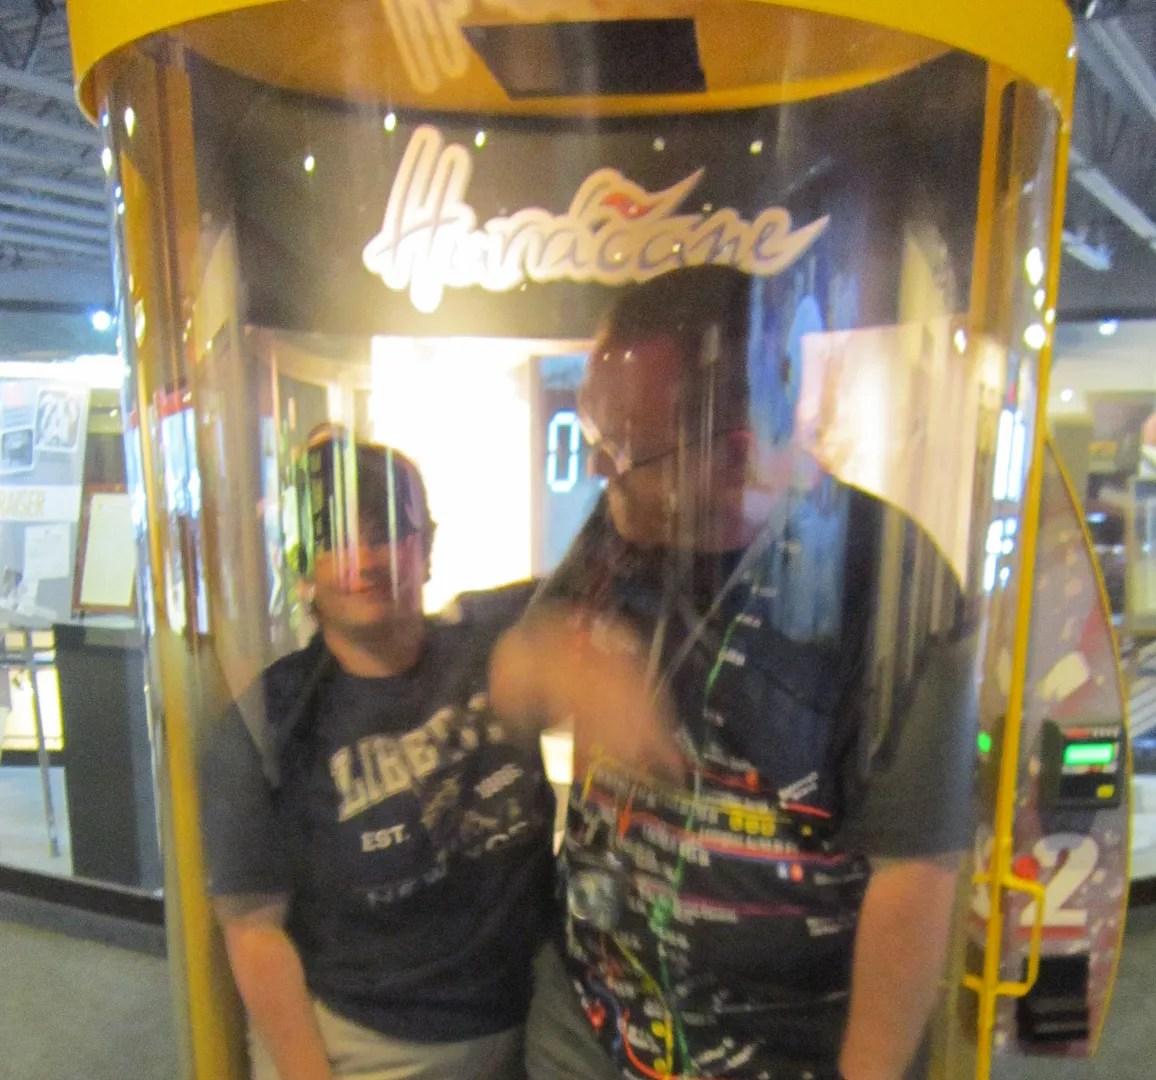 hurricane wind simulator, Kansas Cosmosphere & Space Center, Hutchinson, Kansas